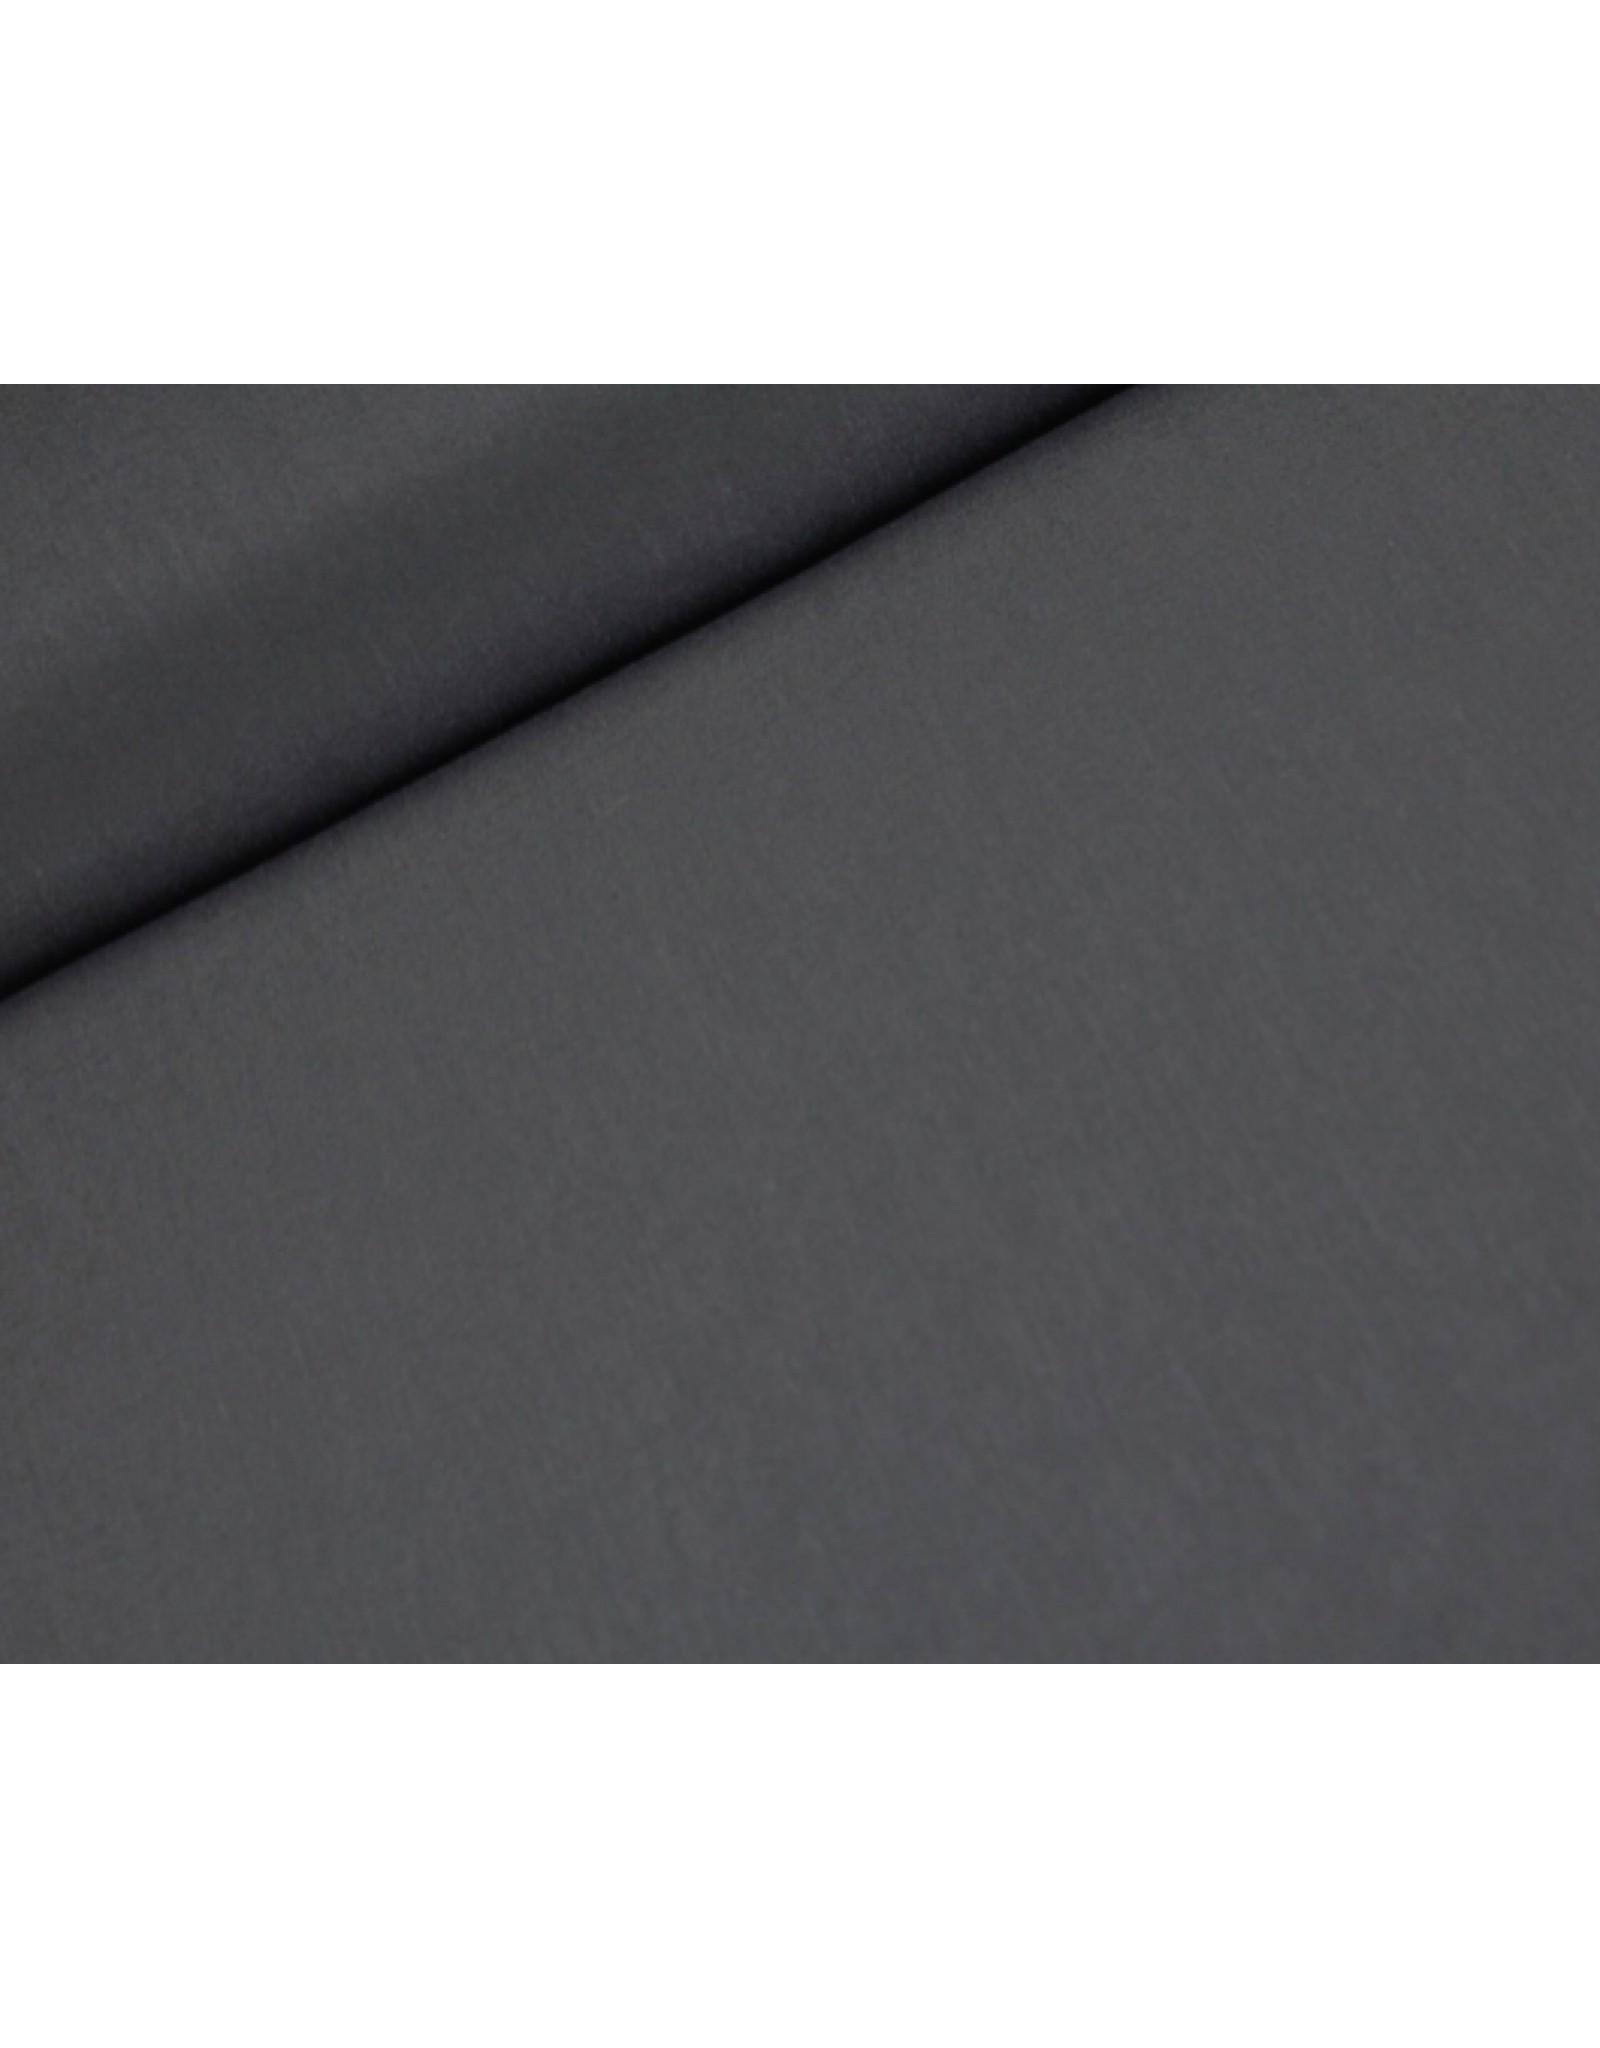 Peach fabric Black